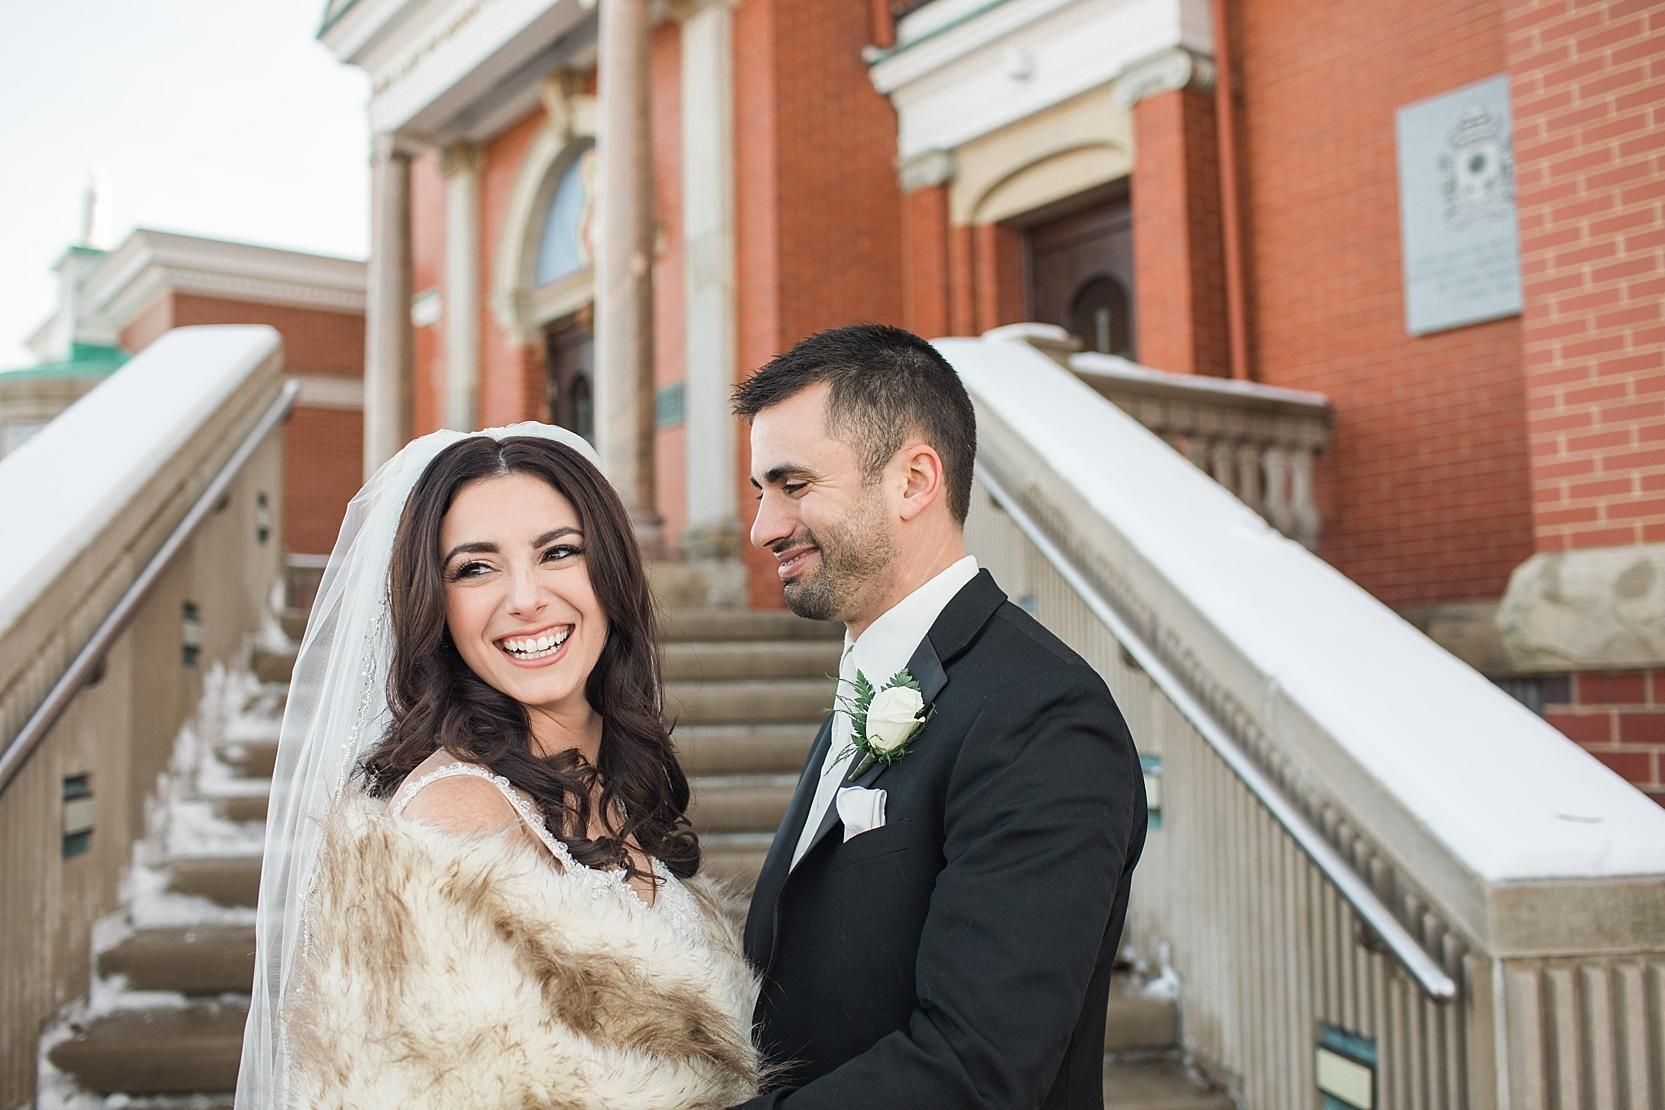 Youngstown Ohio Winter Wedding at Mt. Carmel Church